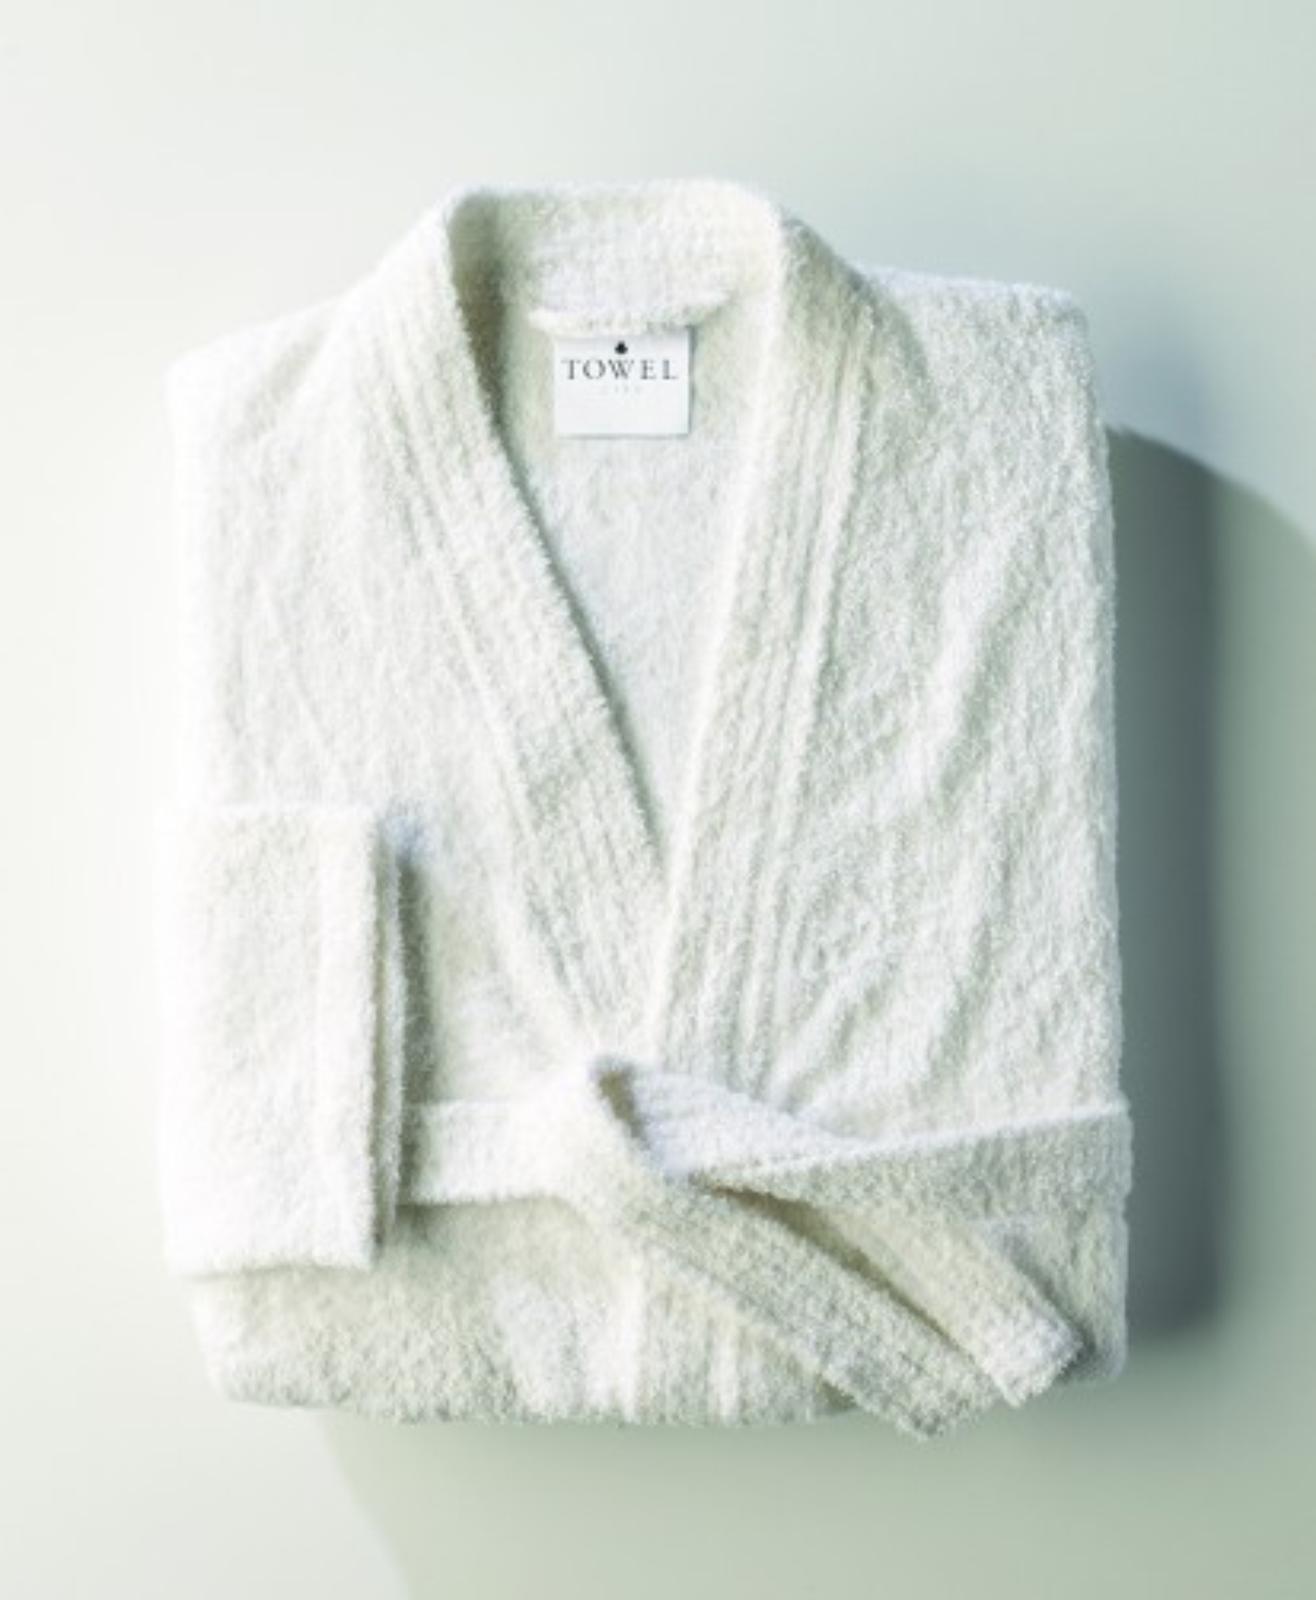 Asciugamano Personalizzato CITY unisex Kimono Kimono Kimono Bianco Cotone Terry BIAN ROBE Monogram d233af